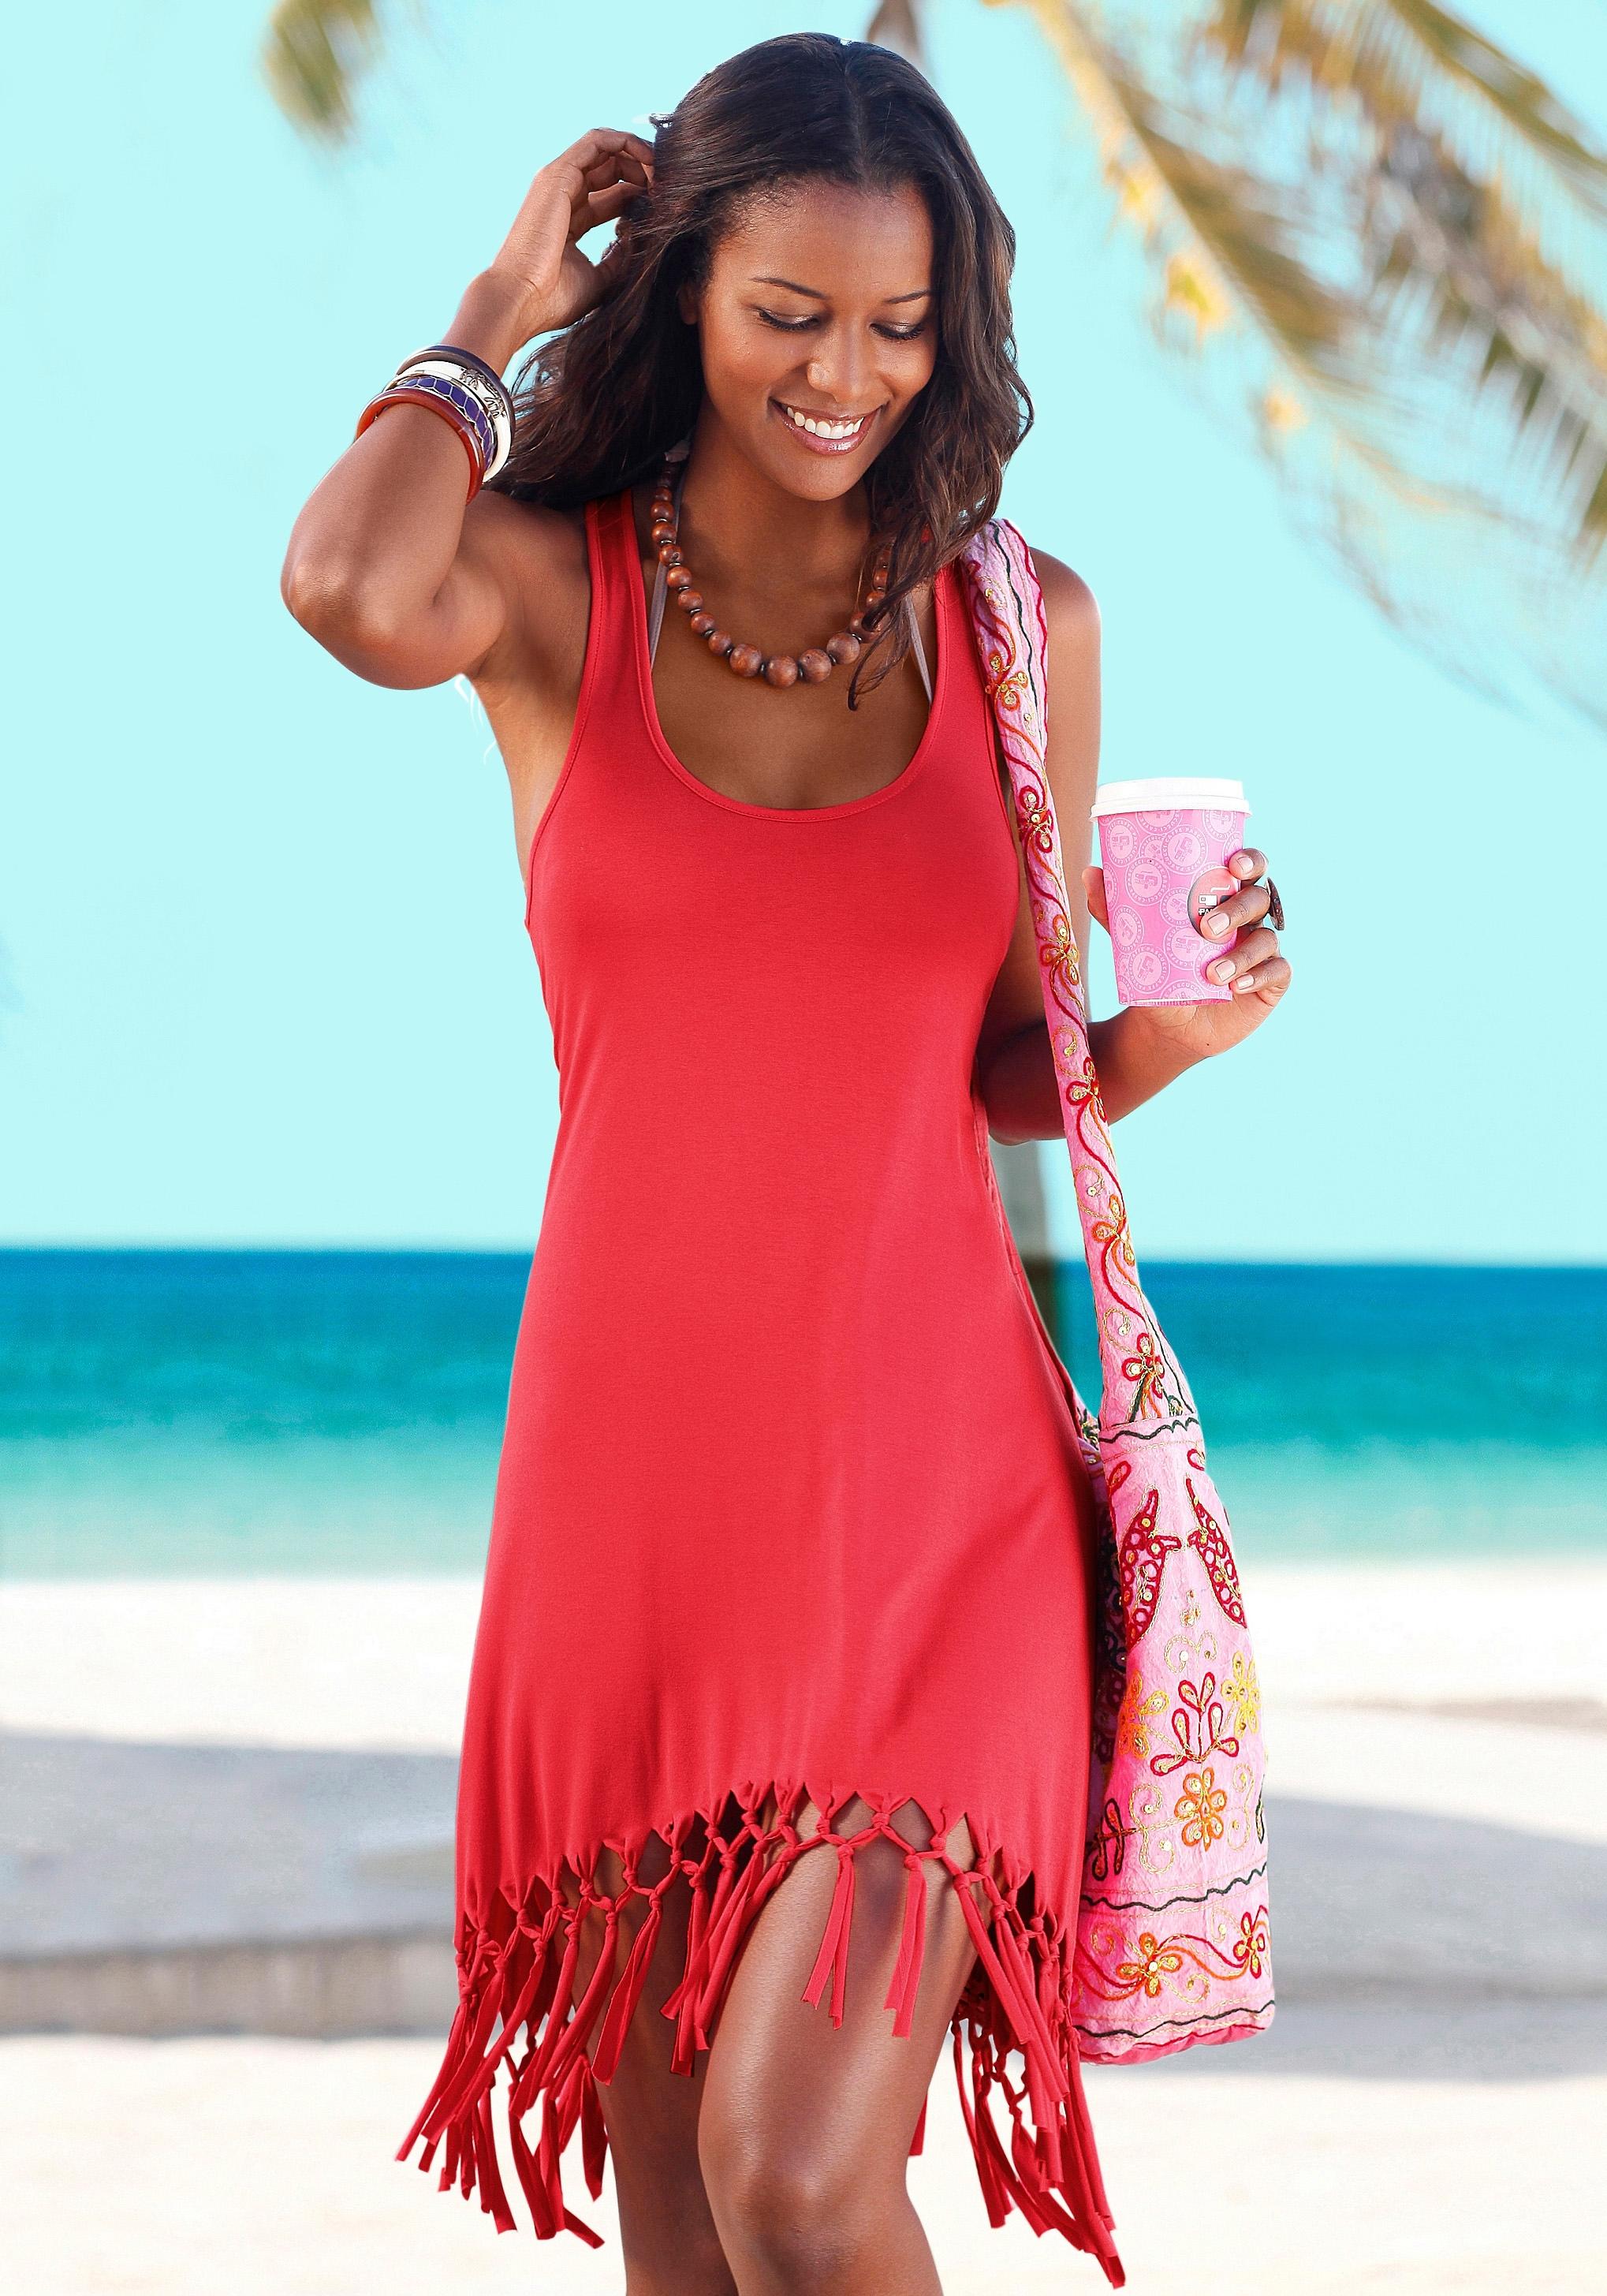 Beachtime Beach Time lang shirt met franje veilig op otto.nl kopen